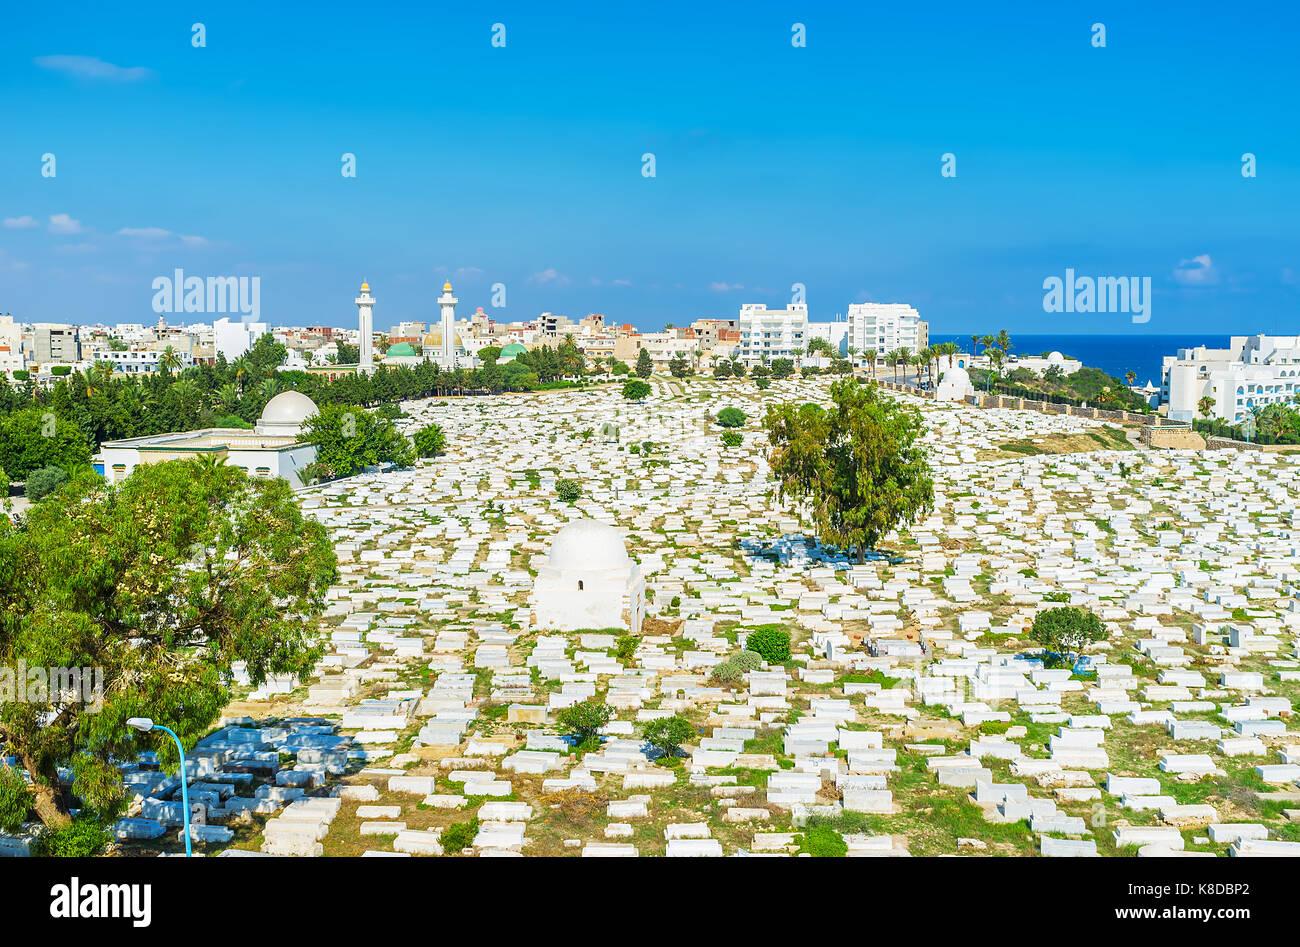 Aerial view of historic Sidi el-Mezeri cemetery with two minarets of Habib Bourguiba Mausoleum on the background, Stock Photo